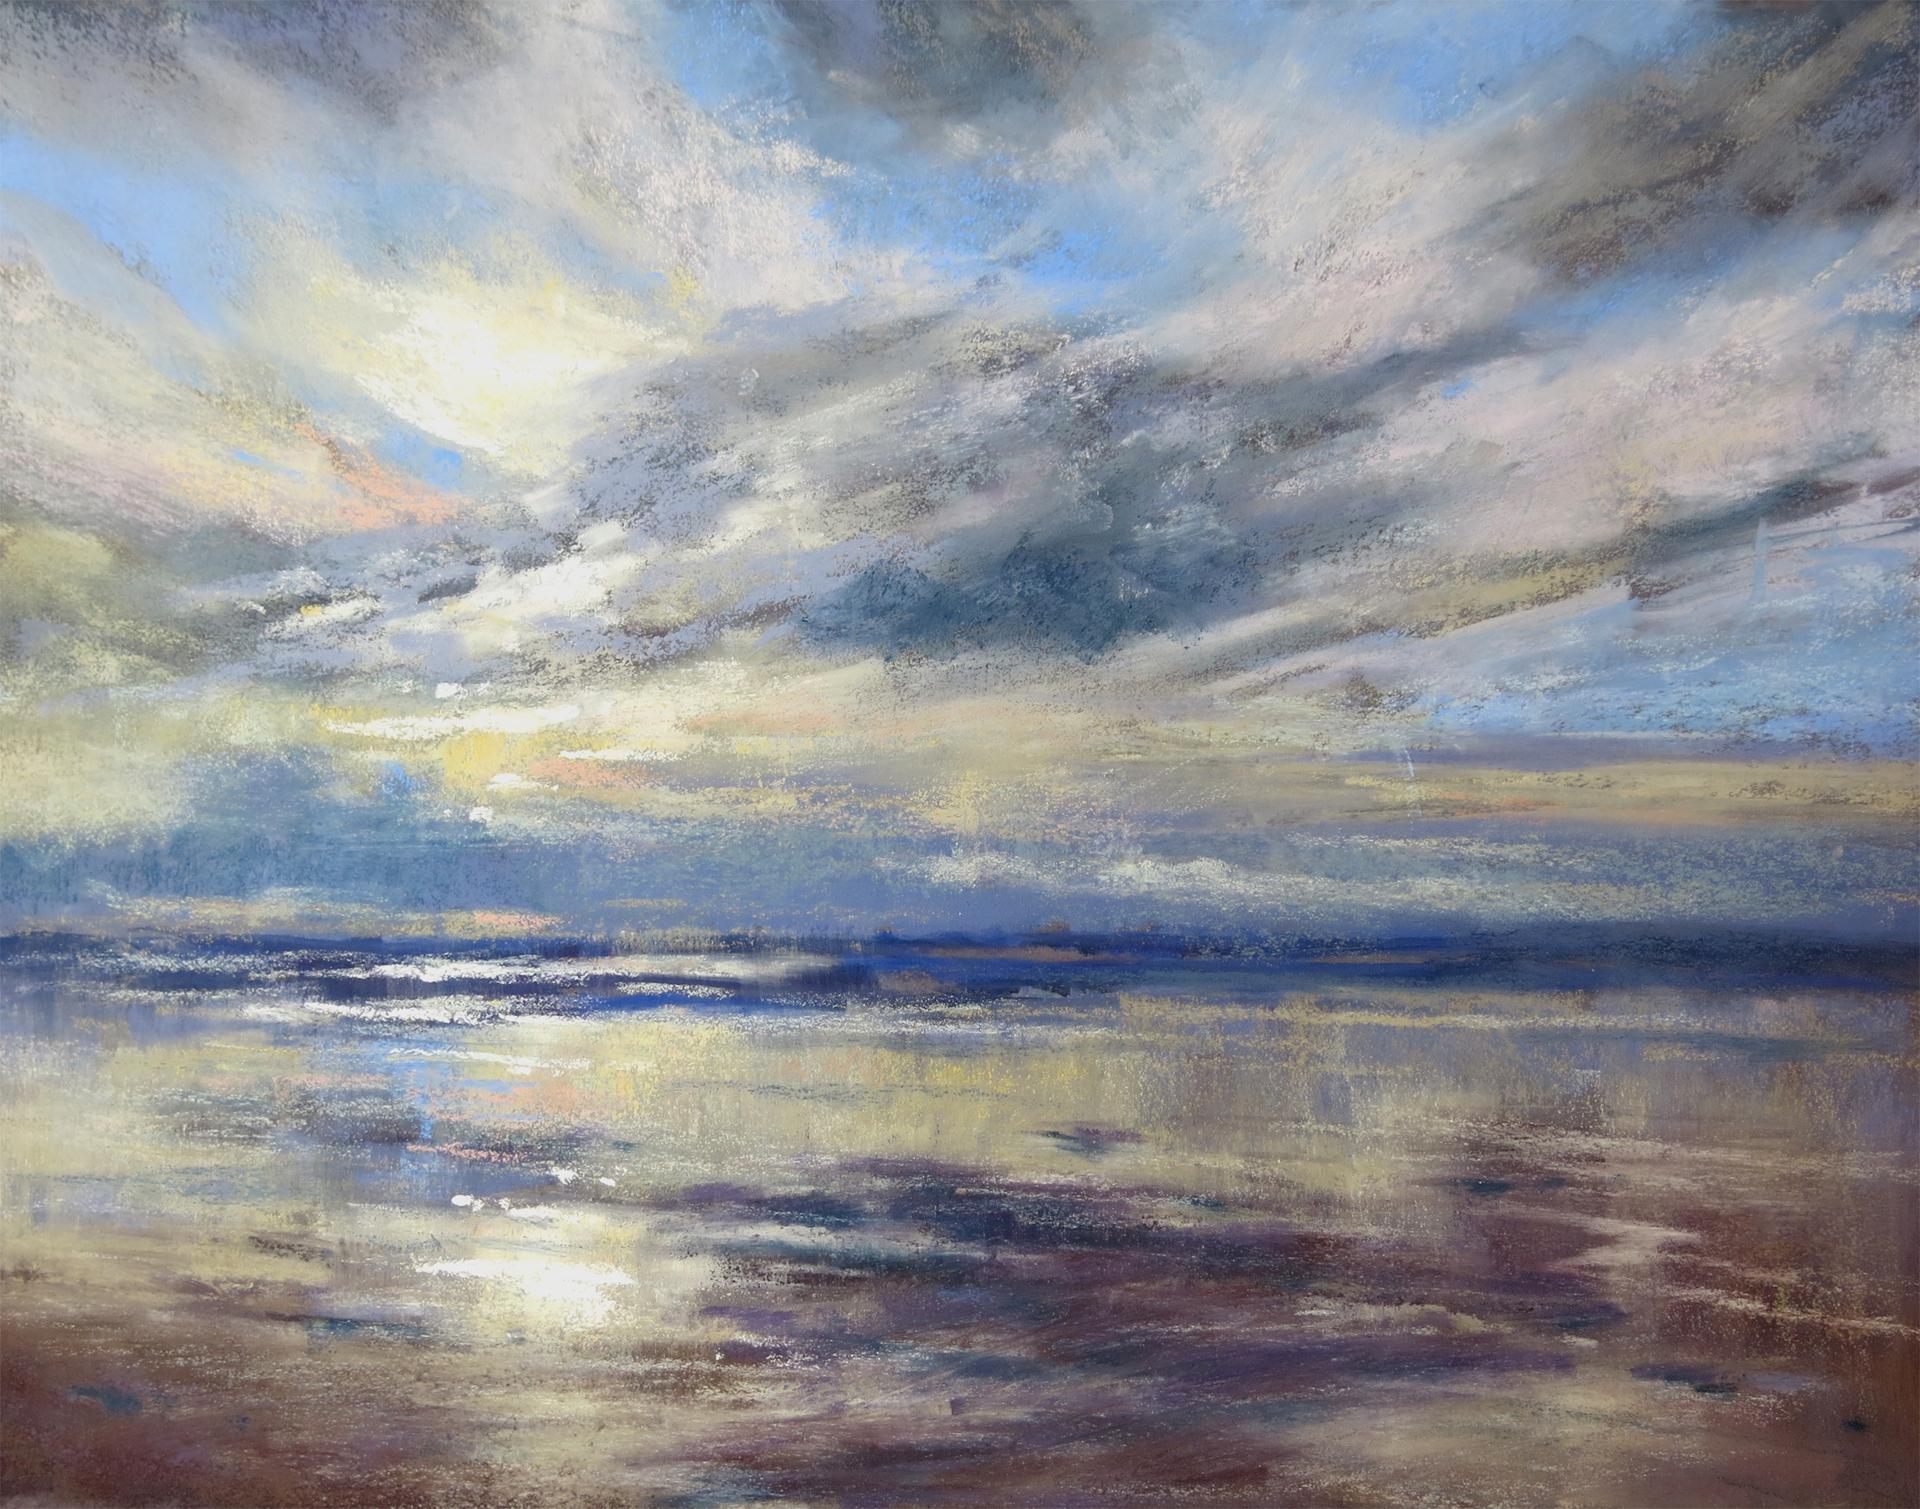 Janis Ellison - Stormy Weather